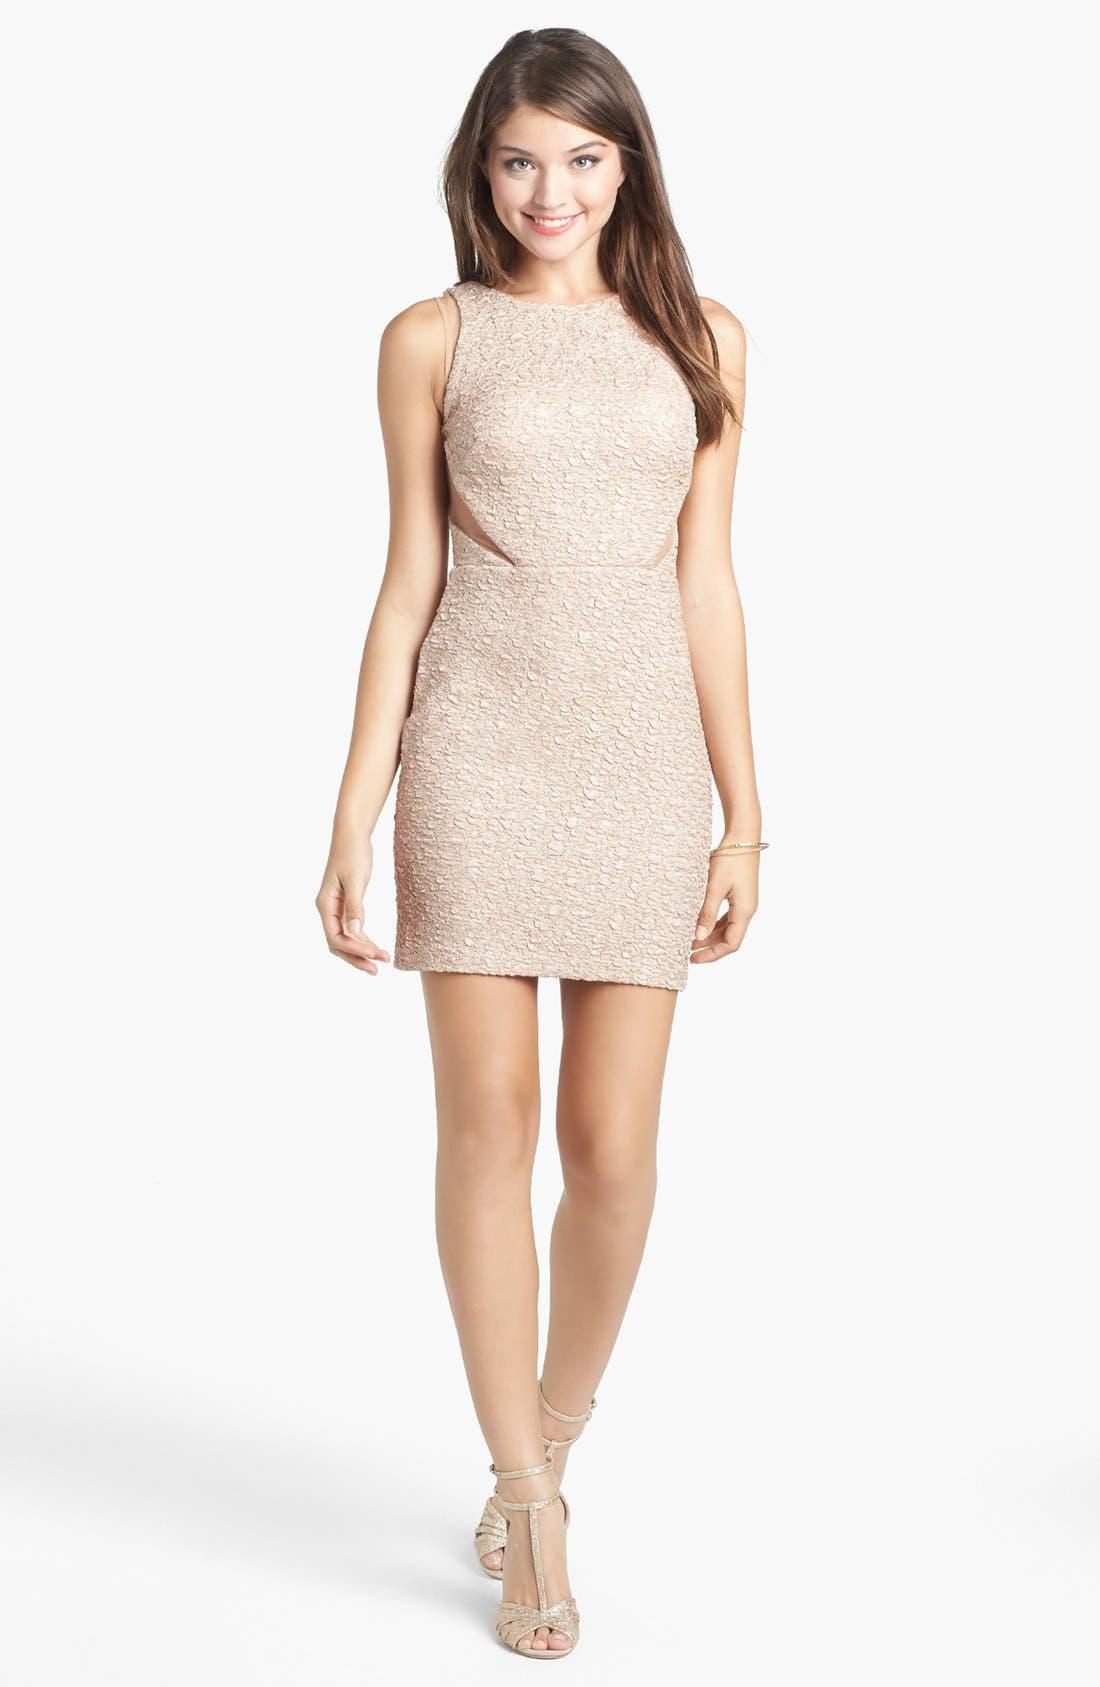 Alternate Image 1 Selected - Hailey Logan Illusion Panel Textured Body-Con Dress (Juniors)